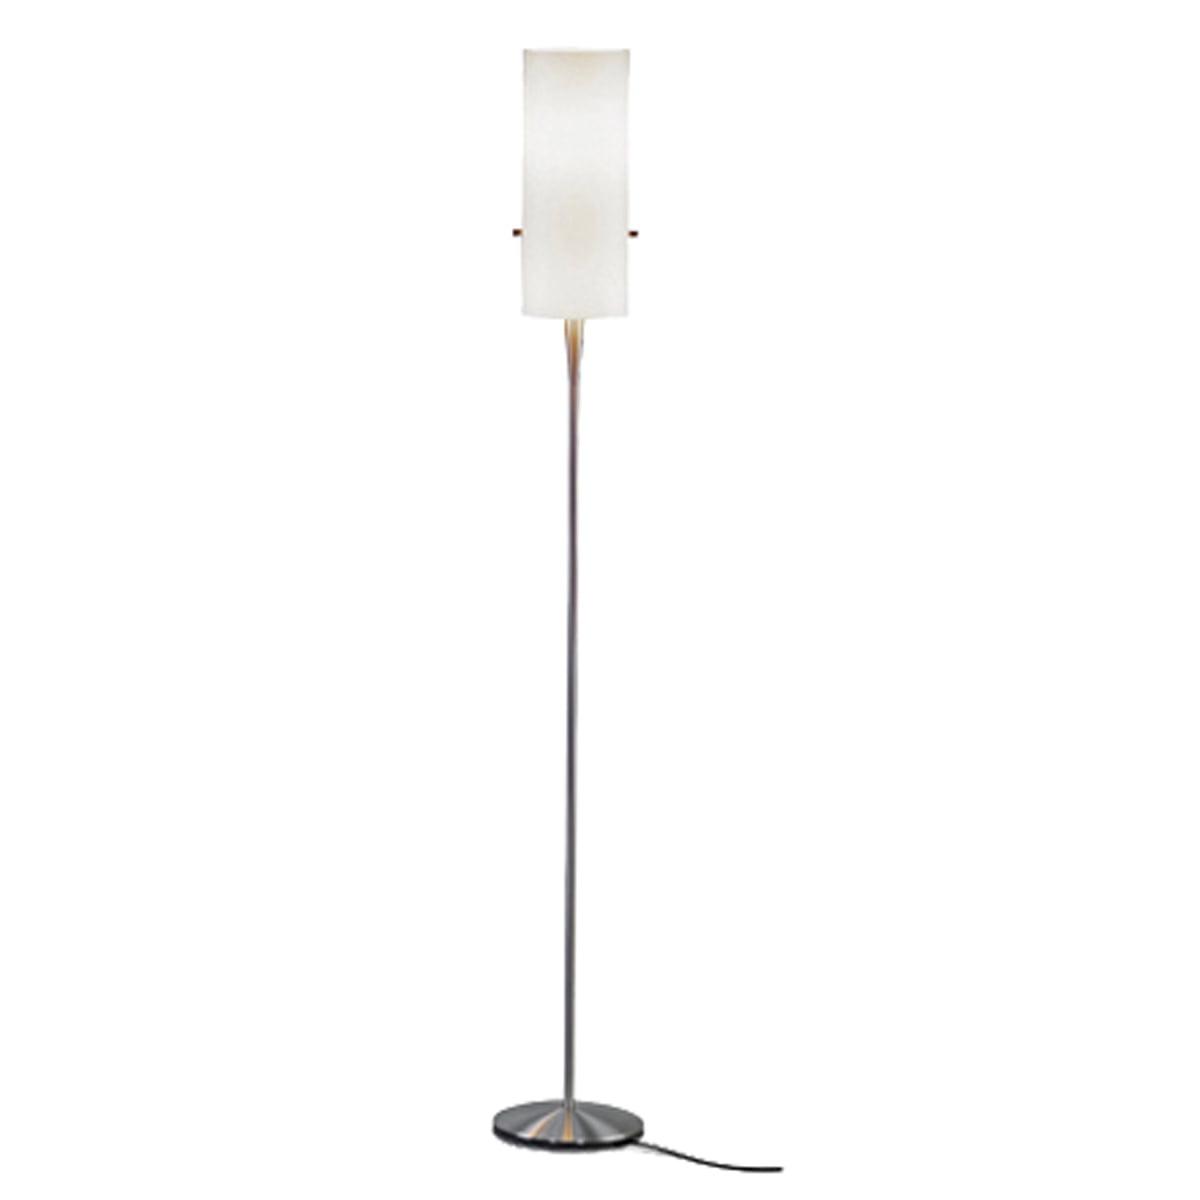 buy online 923d3 09ac8 serien.lighting - Club Floor Lamp S, white